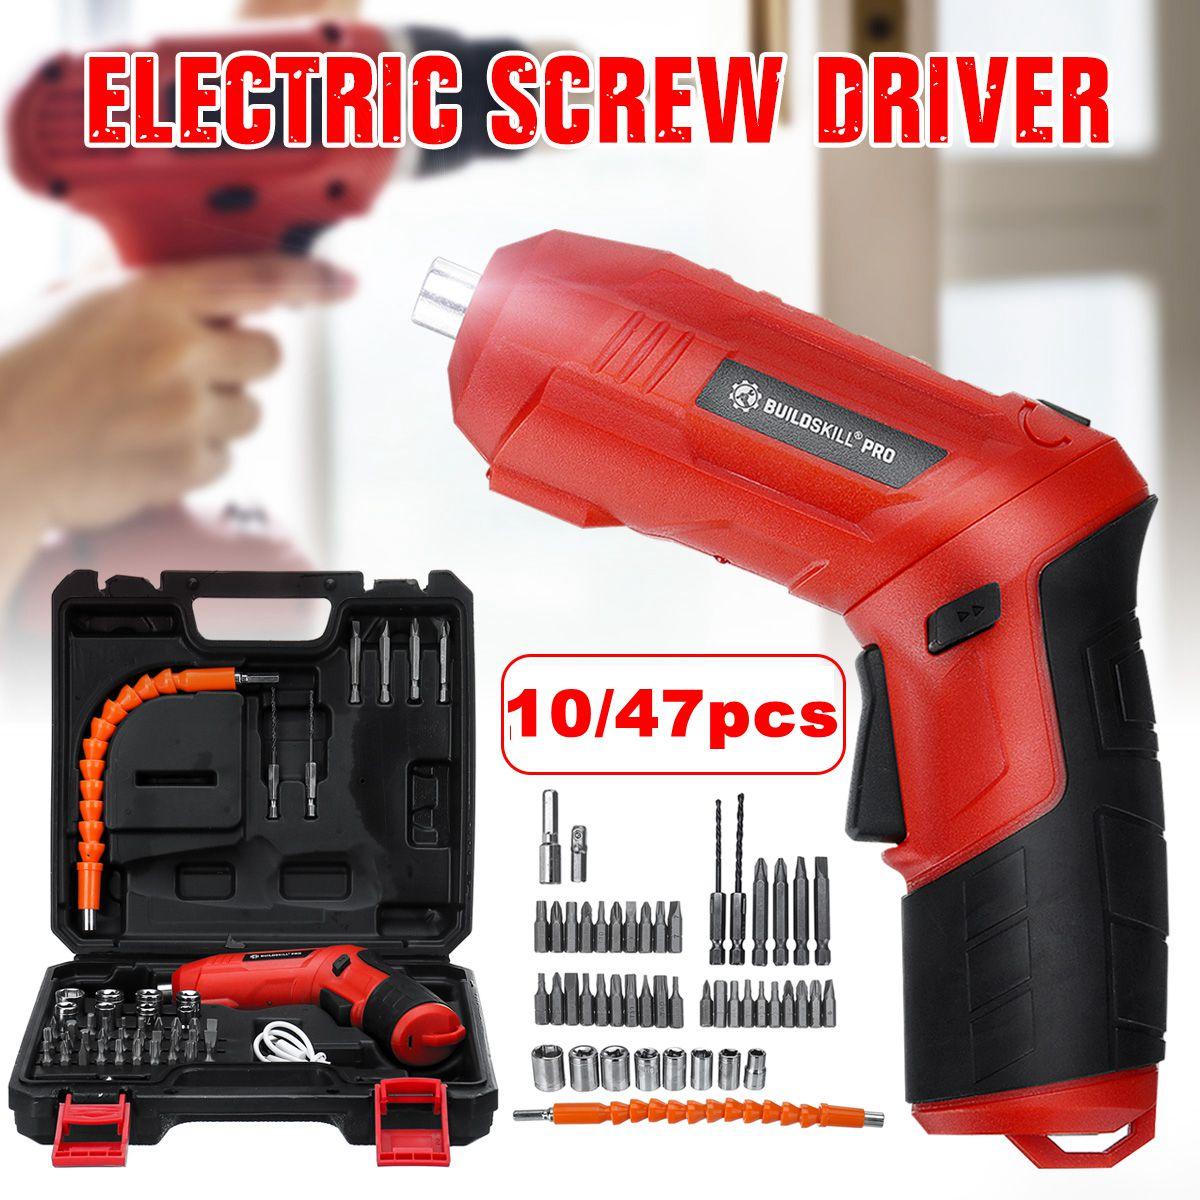 10/47pcs USB Electric Screwdriver Mini Electric Drill Set Screw Driver Rechargeable Li-ion Battery Cordless Power Screwdriver